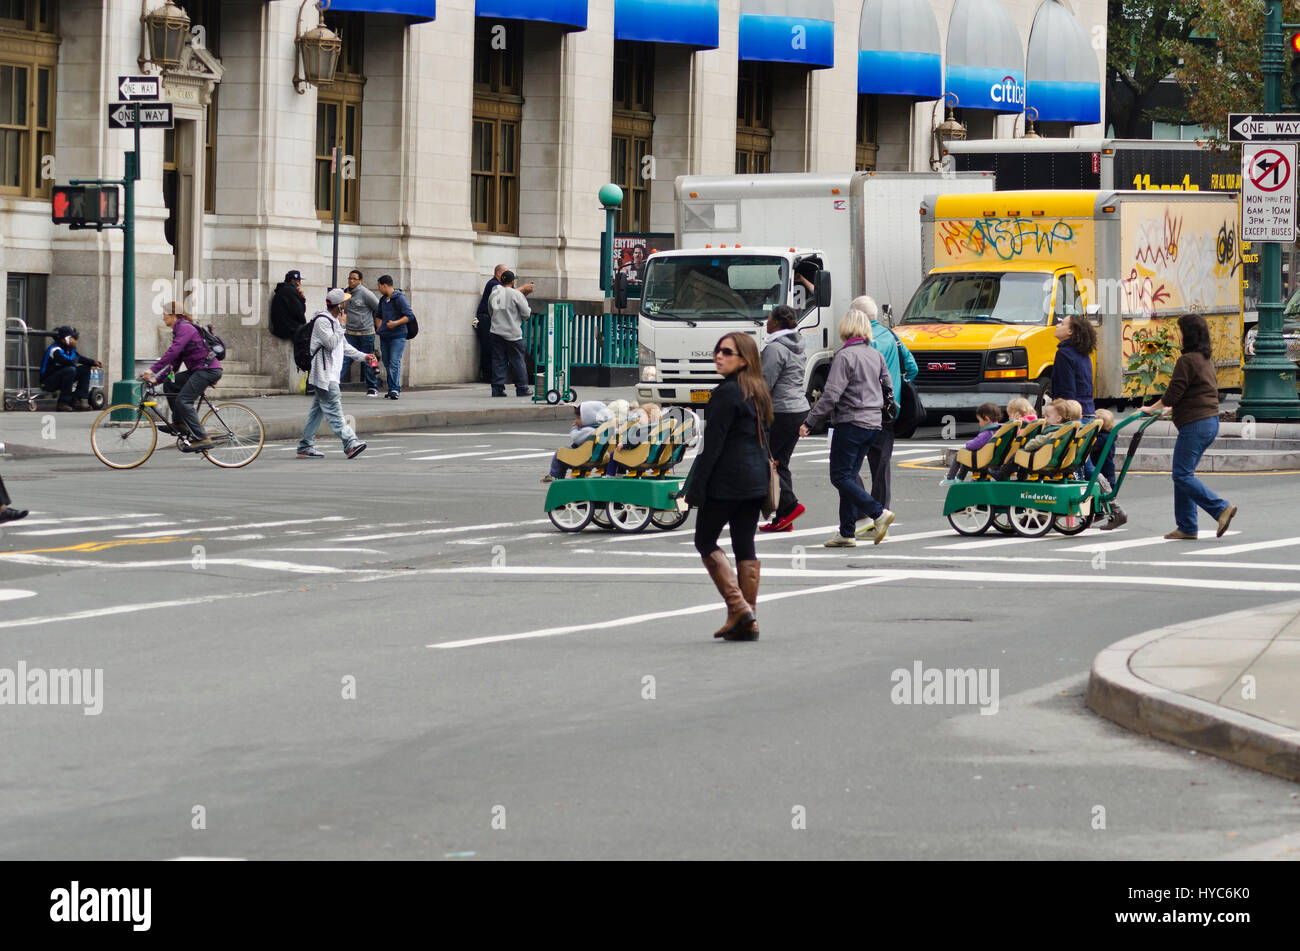 road crossing with children garden multi seater pram, new york, usa - Stock Image